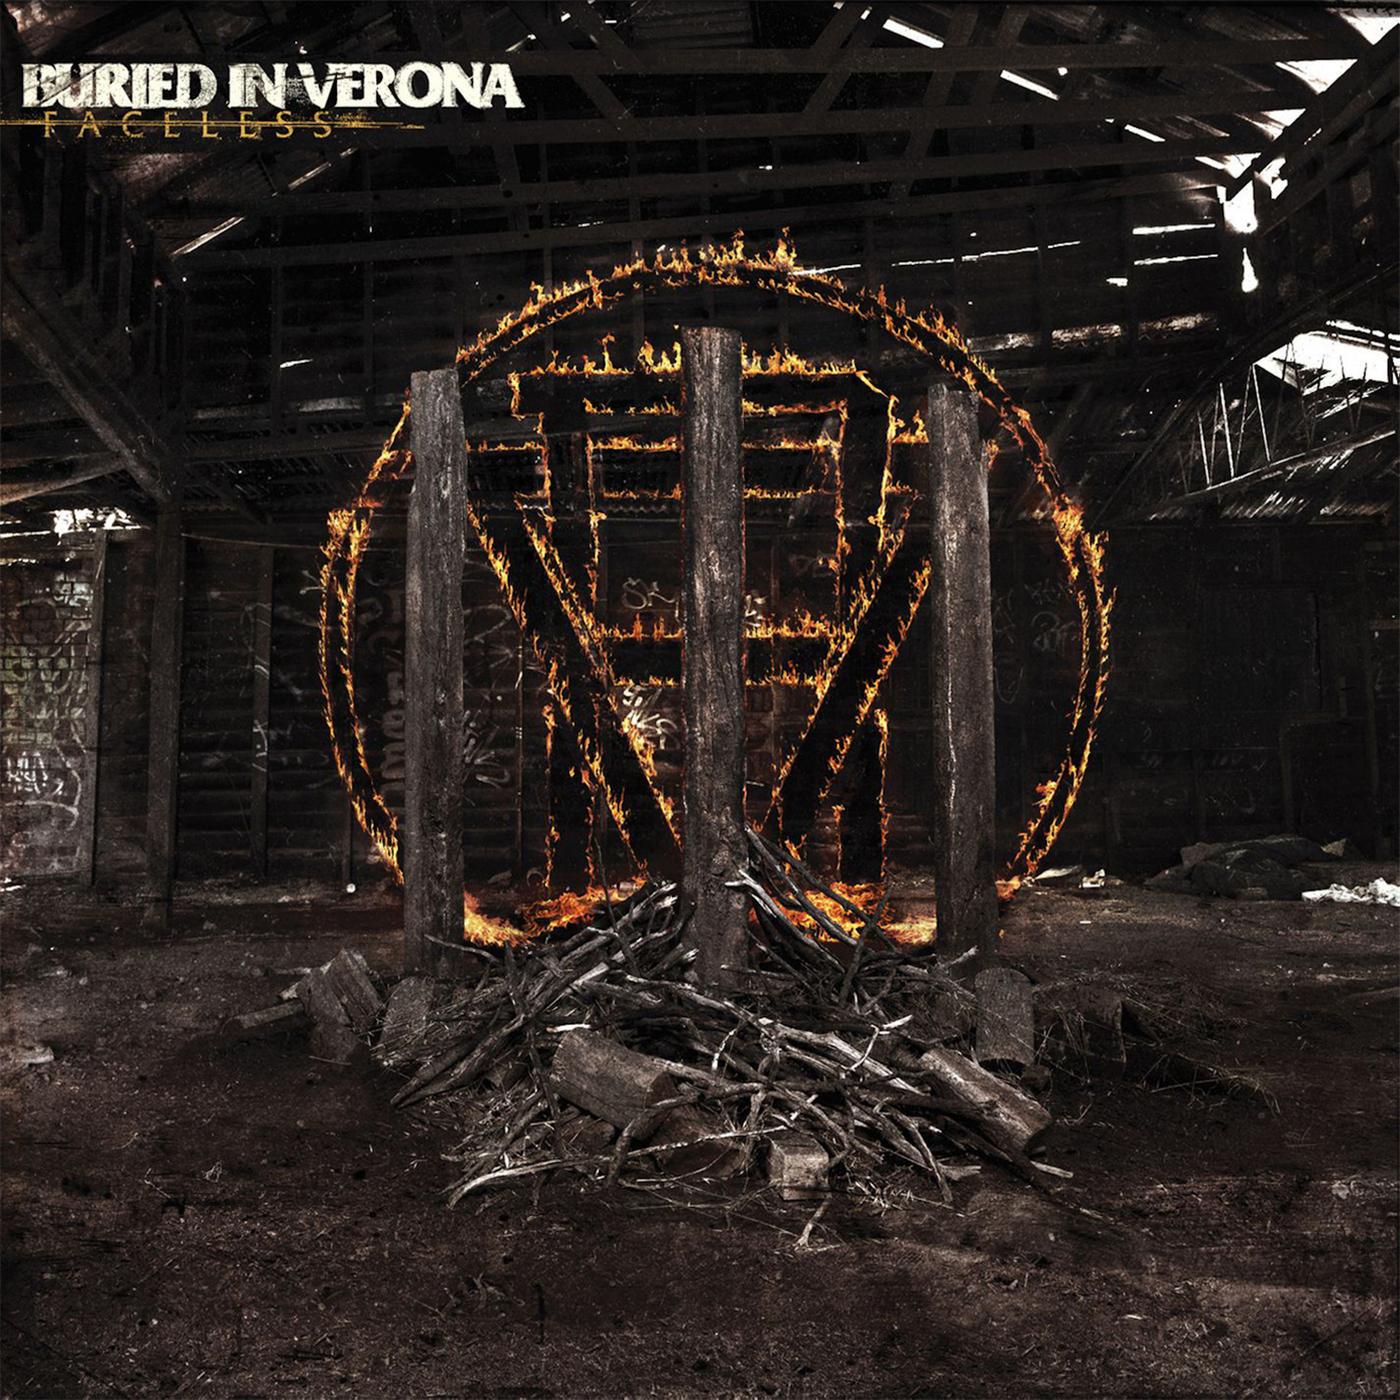 Buried in Verona - Faceless (2014)